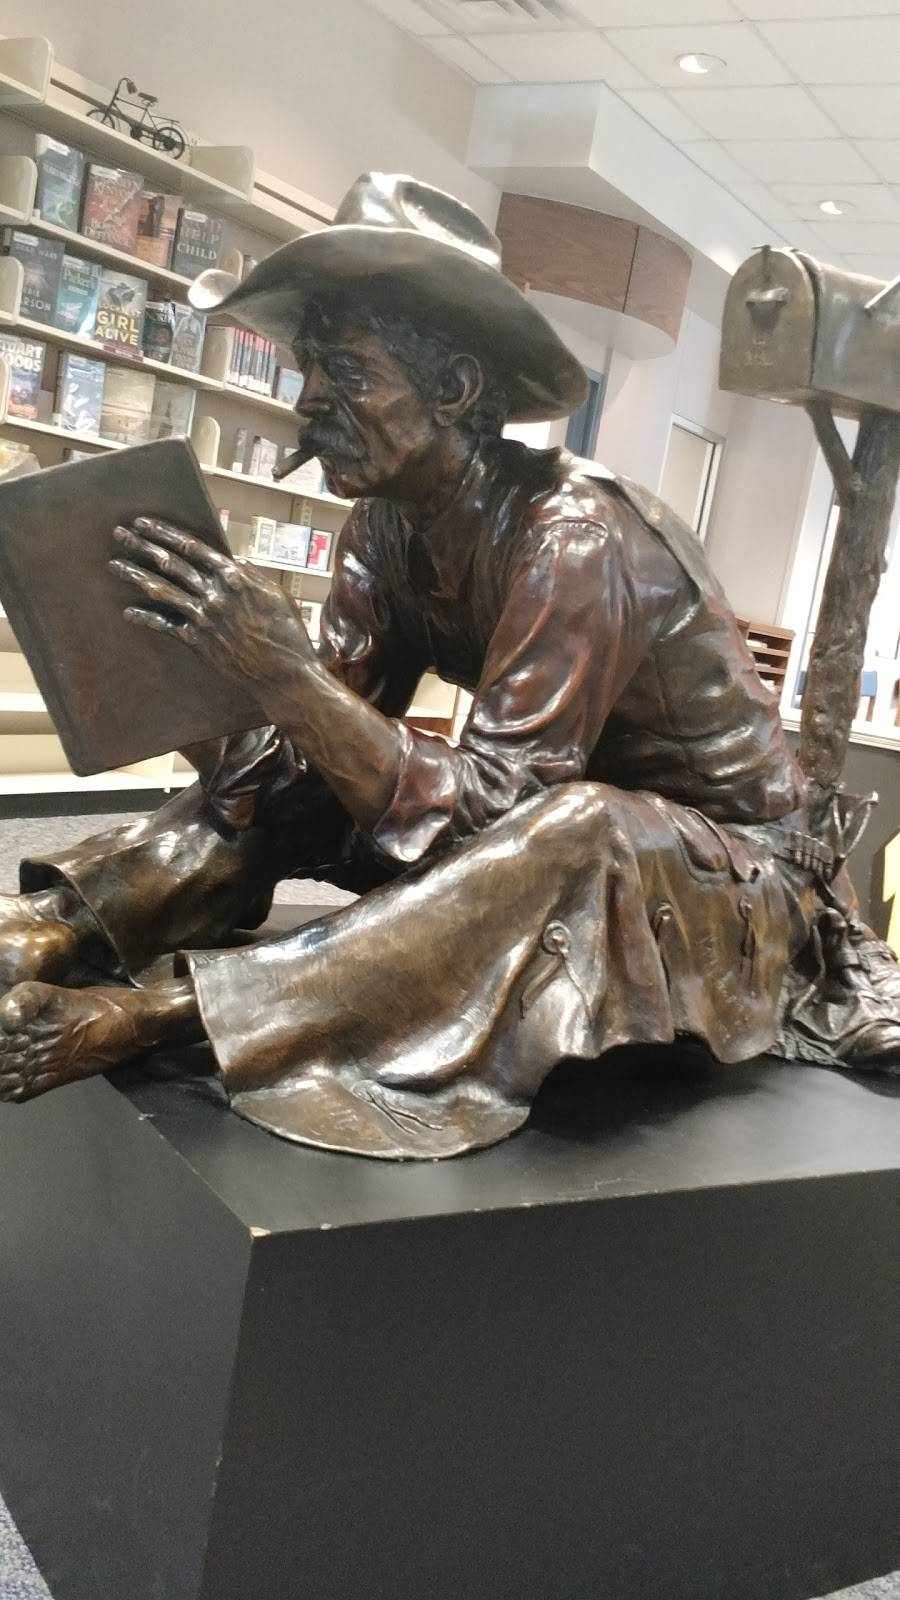 John Ed Keeter Public Library - library  | Photo 6 of 10 | Address: 355 W McLeroy Blvd, Saginaw, TX 76179, USA | Phone: (817) 230-0300